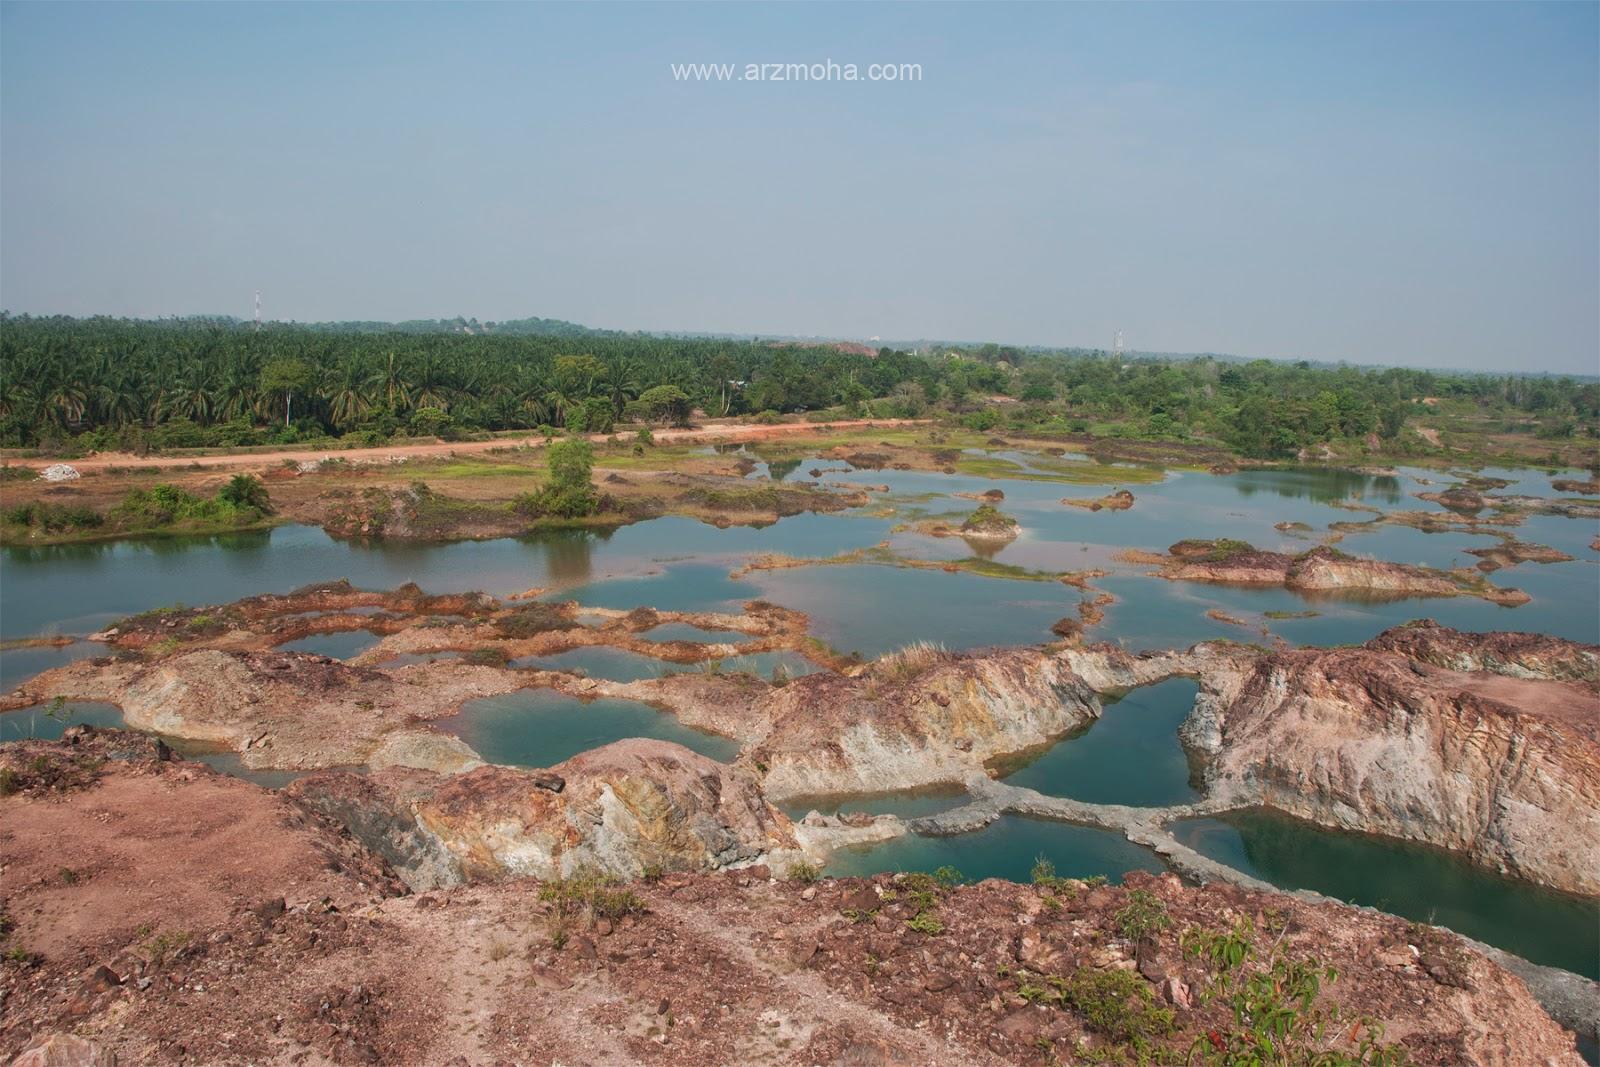 tempat menarik, pulau pinang, gambar cantik, nature, alam semulajadi, tempat perlancongan,